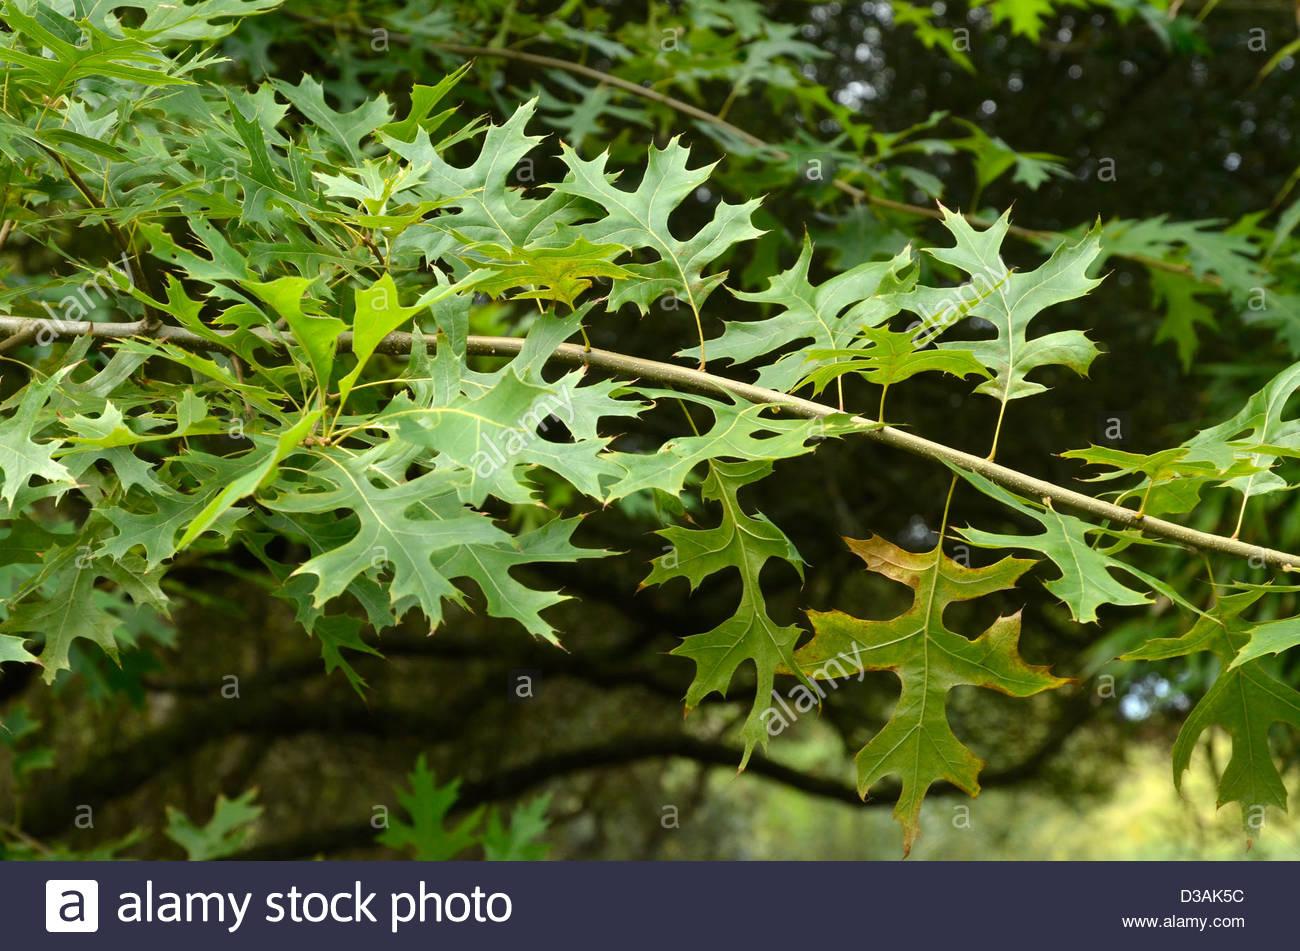 Oak Marsh, quercus palustris, Garden La Boulaye, Grand Cosquet, Locmaria, Belle-île-en-Mer, Brittany, Morbihan, - Stock Image